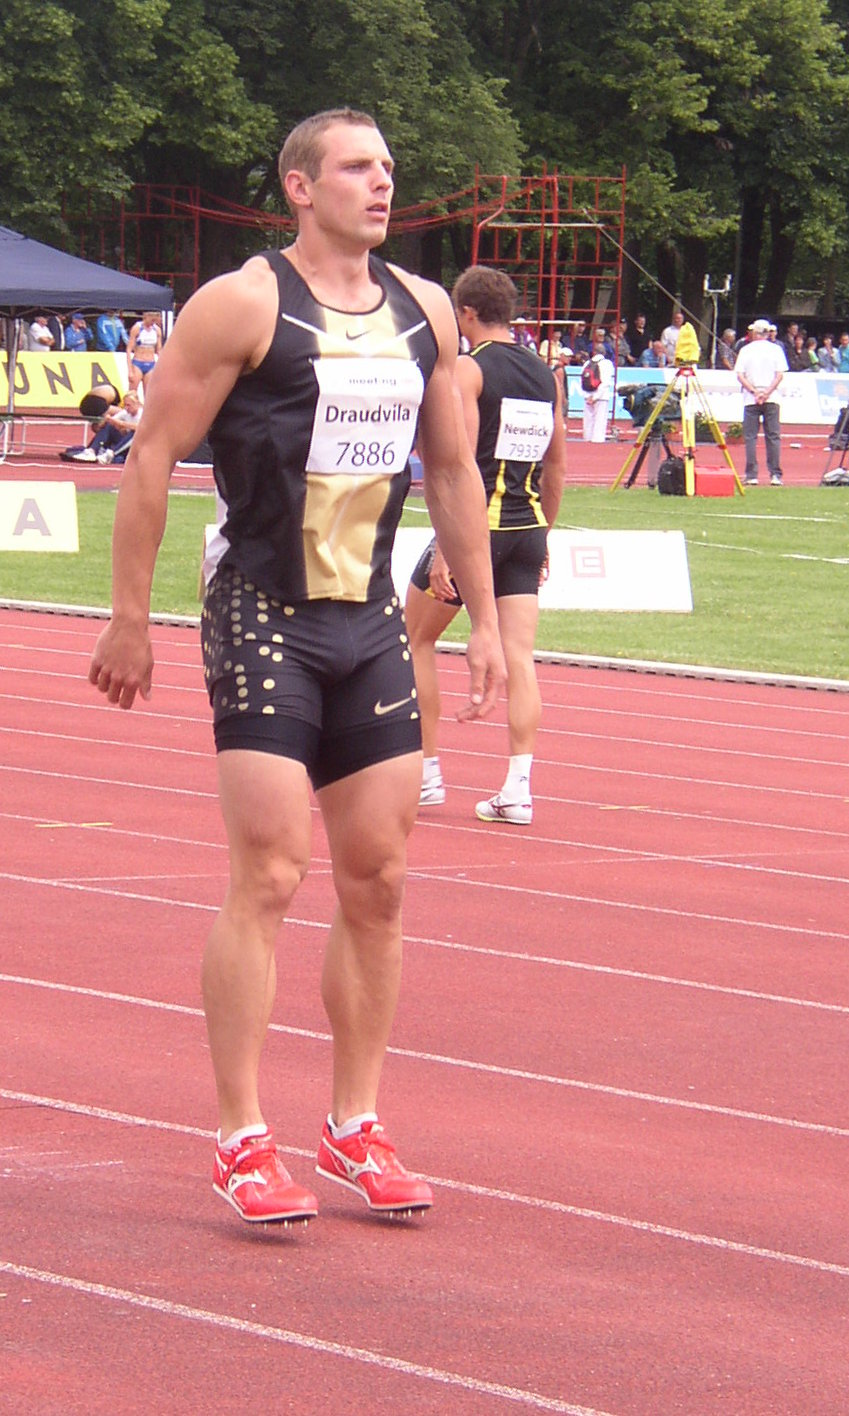 Darius Draudvila Wikipedia